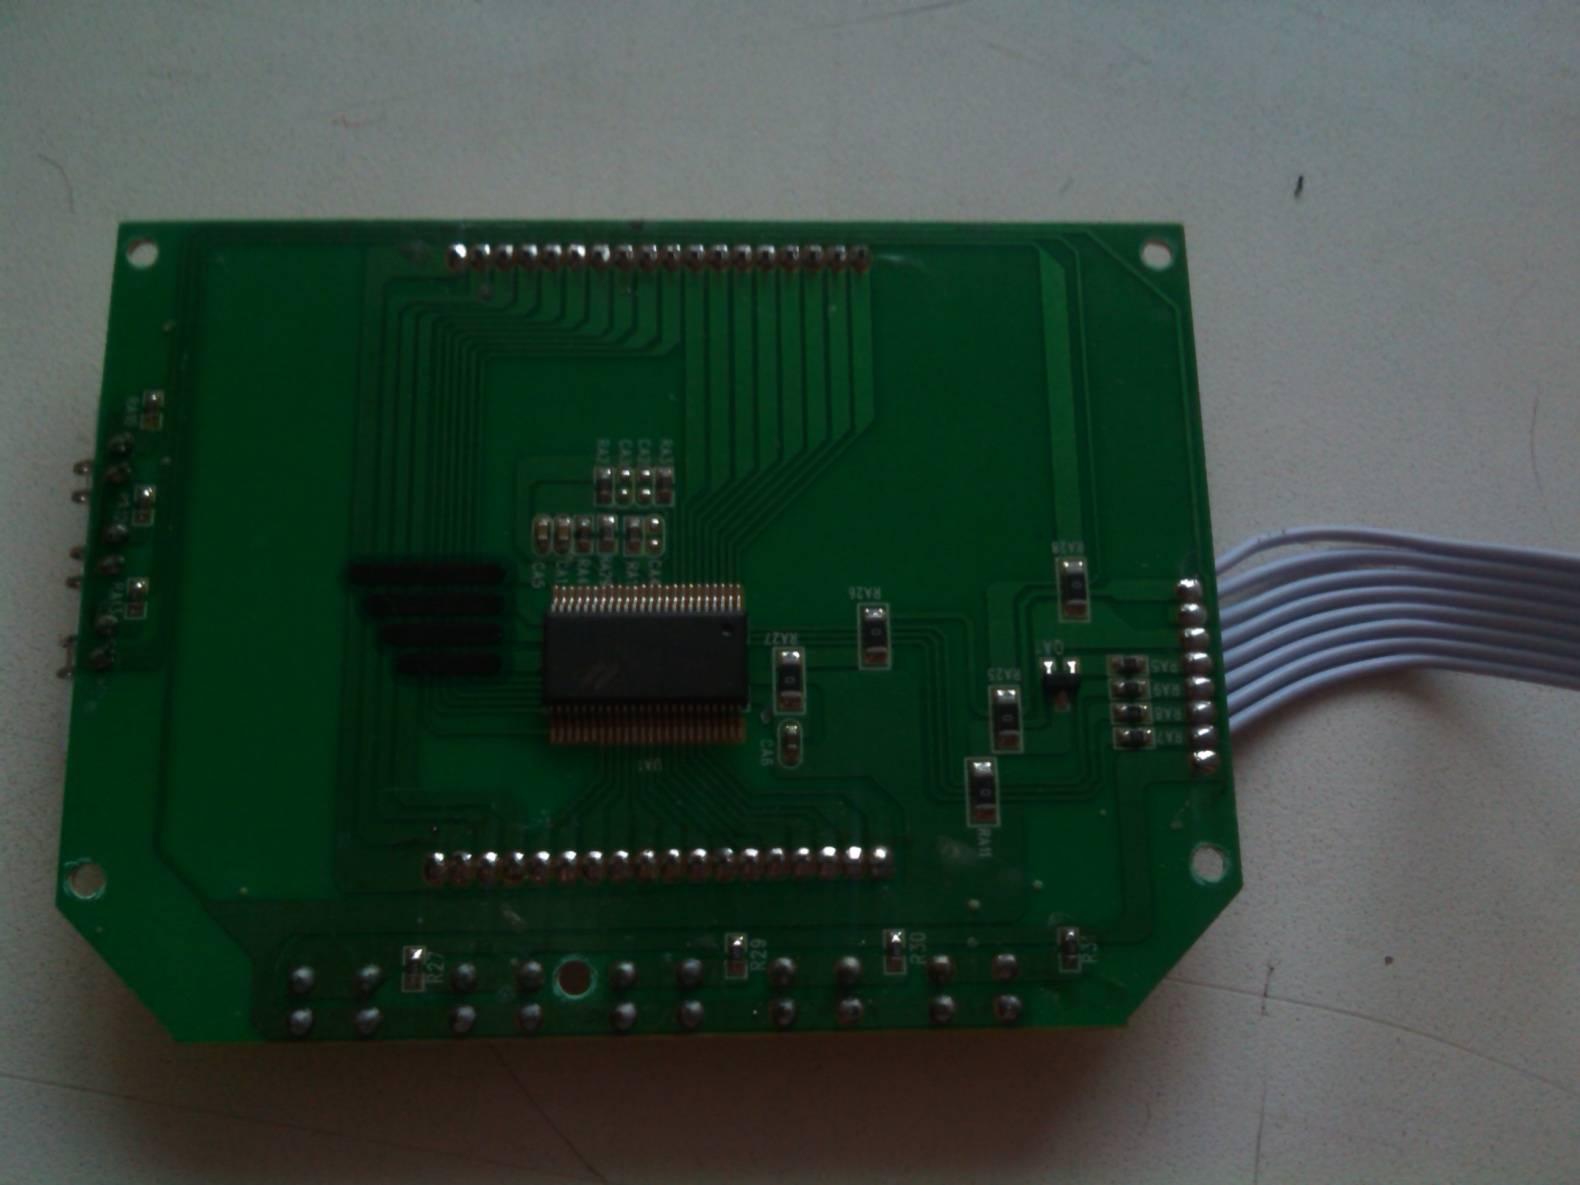 Ht1621 lcd контроллер с организацией памяти 32х4 для работы с.